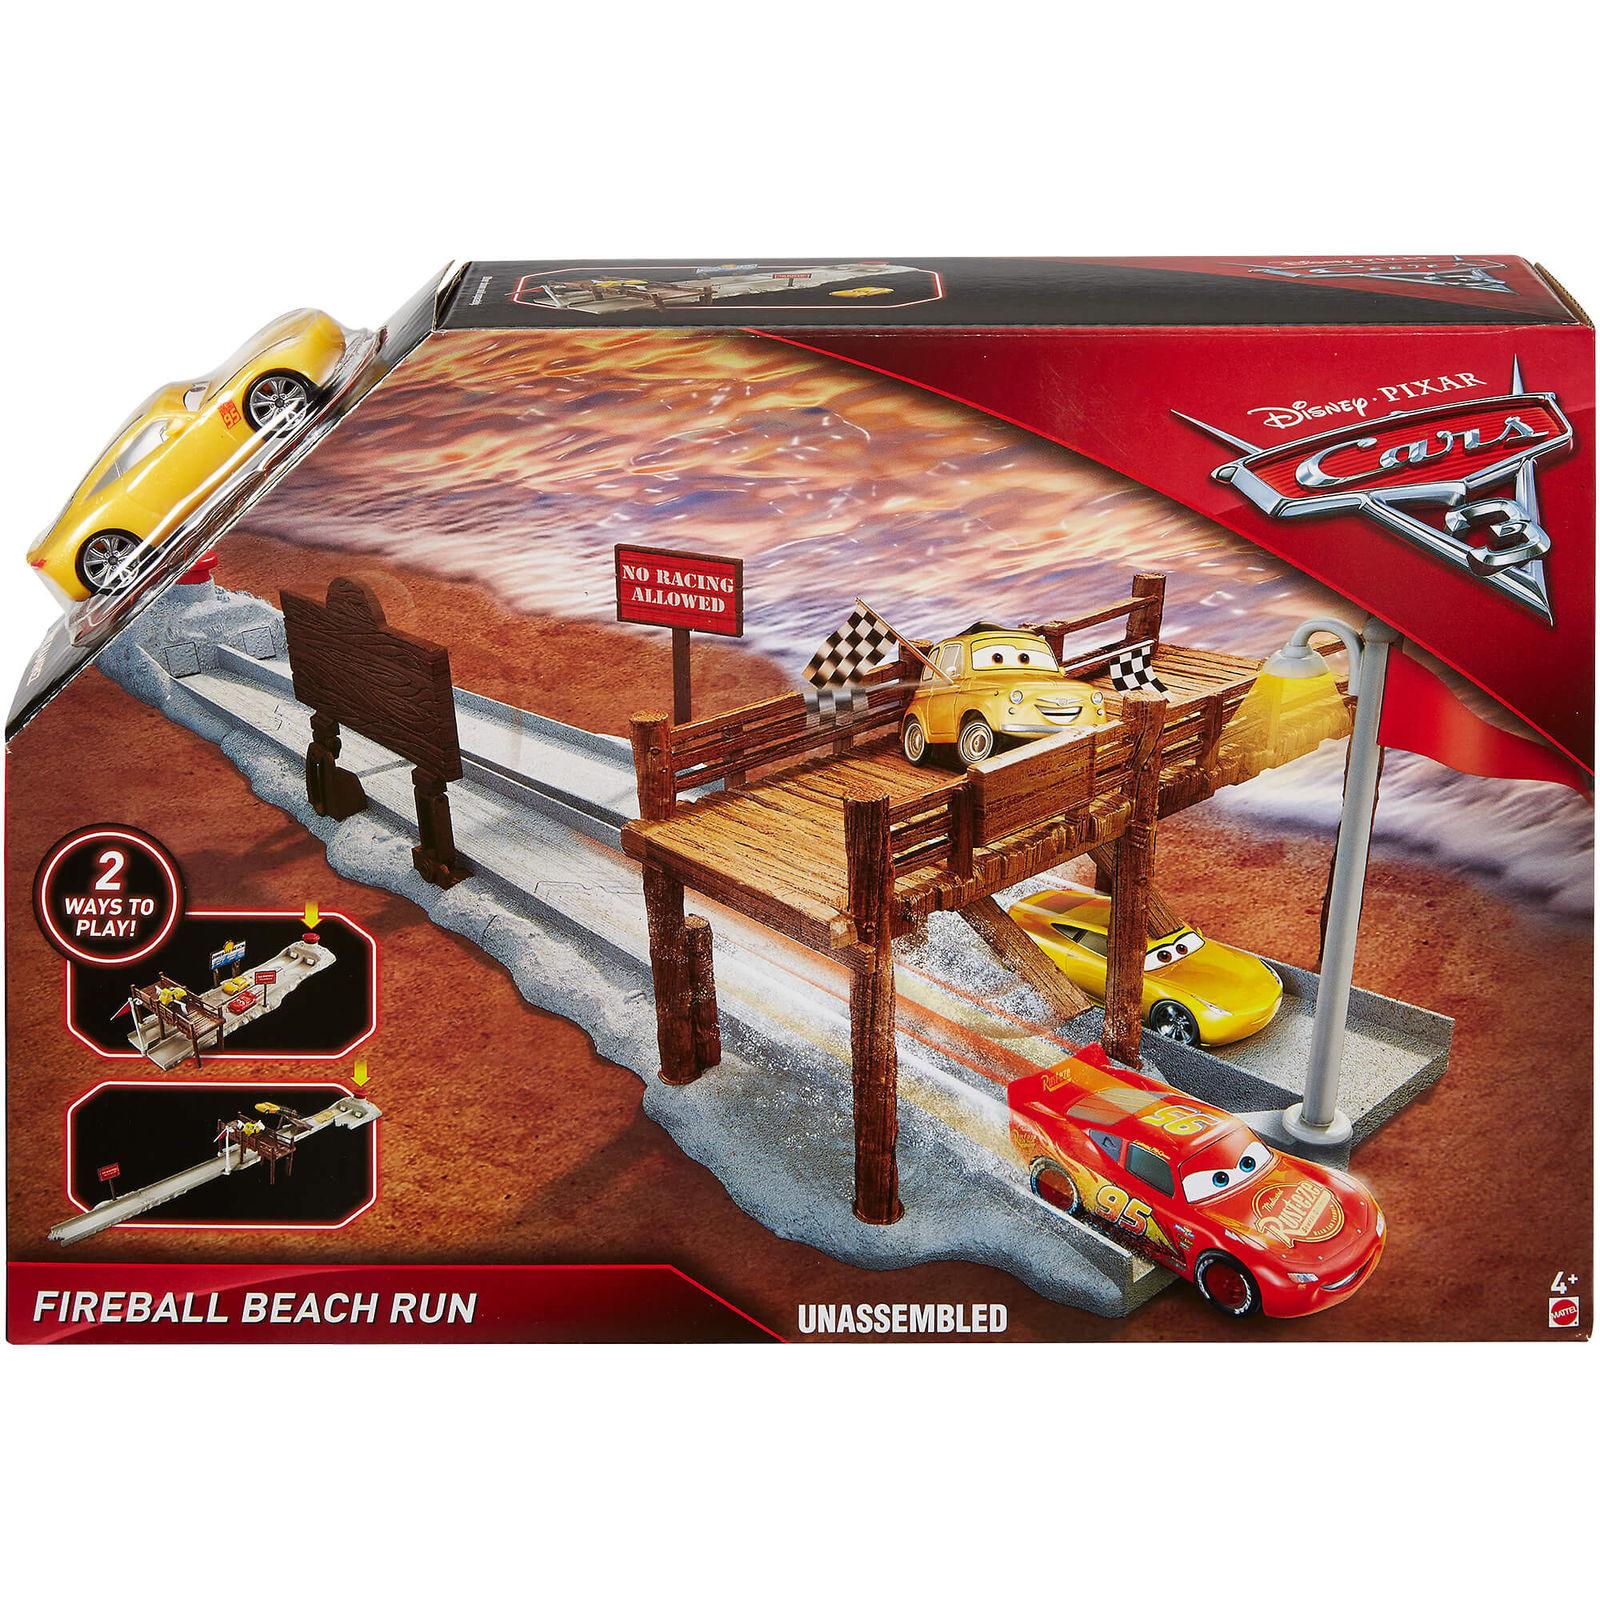 Cars 3 - Fireball Beach Run Playset (DVT47)